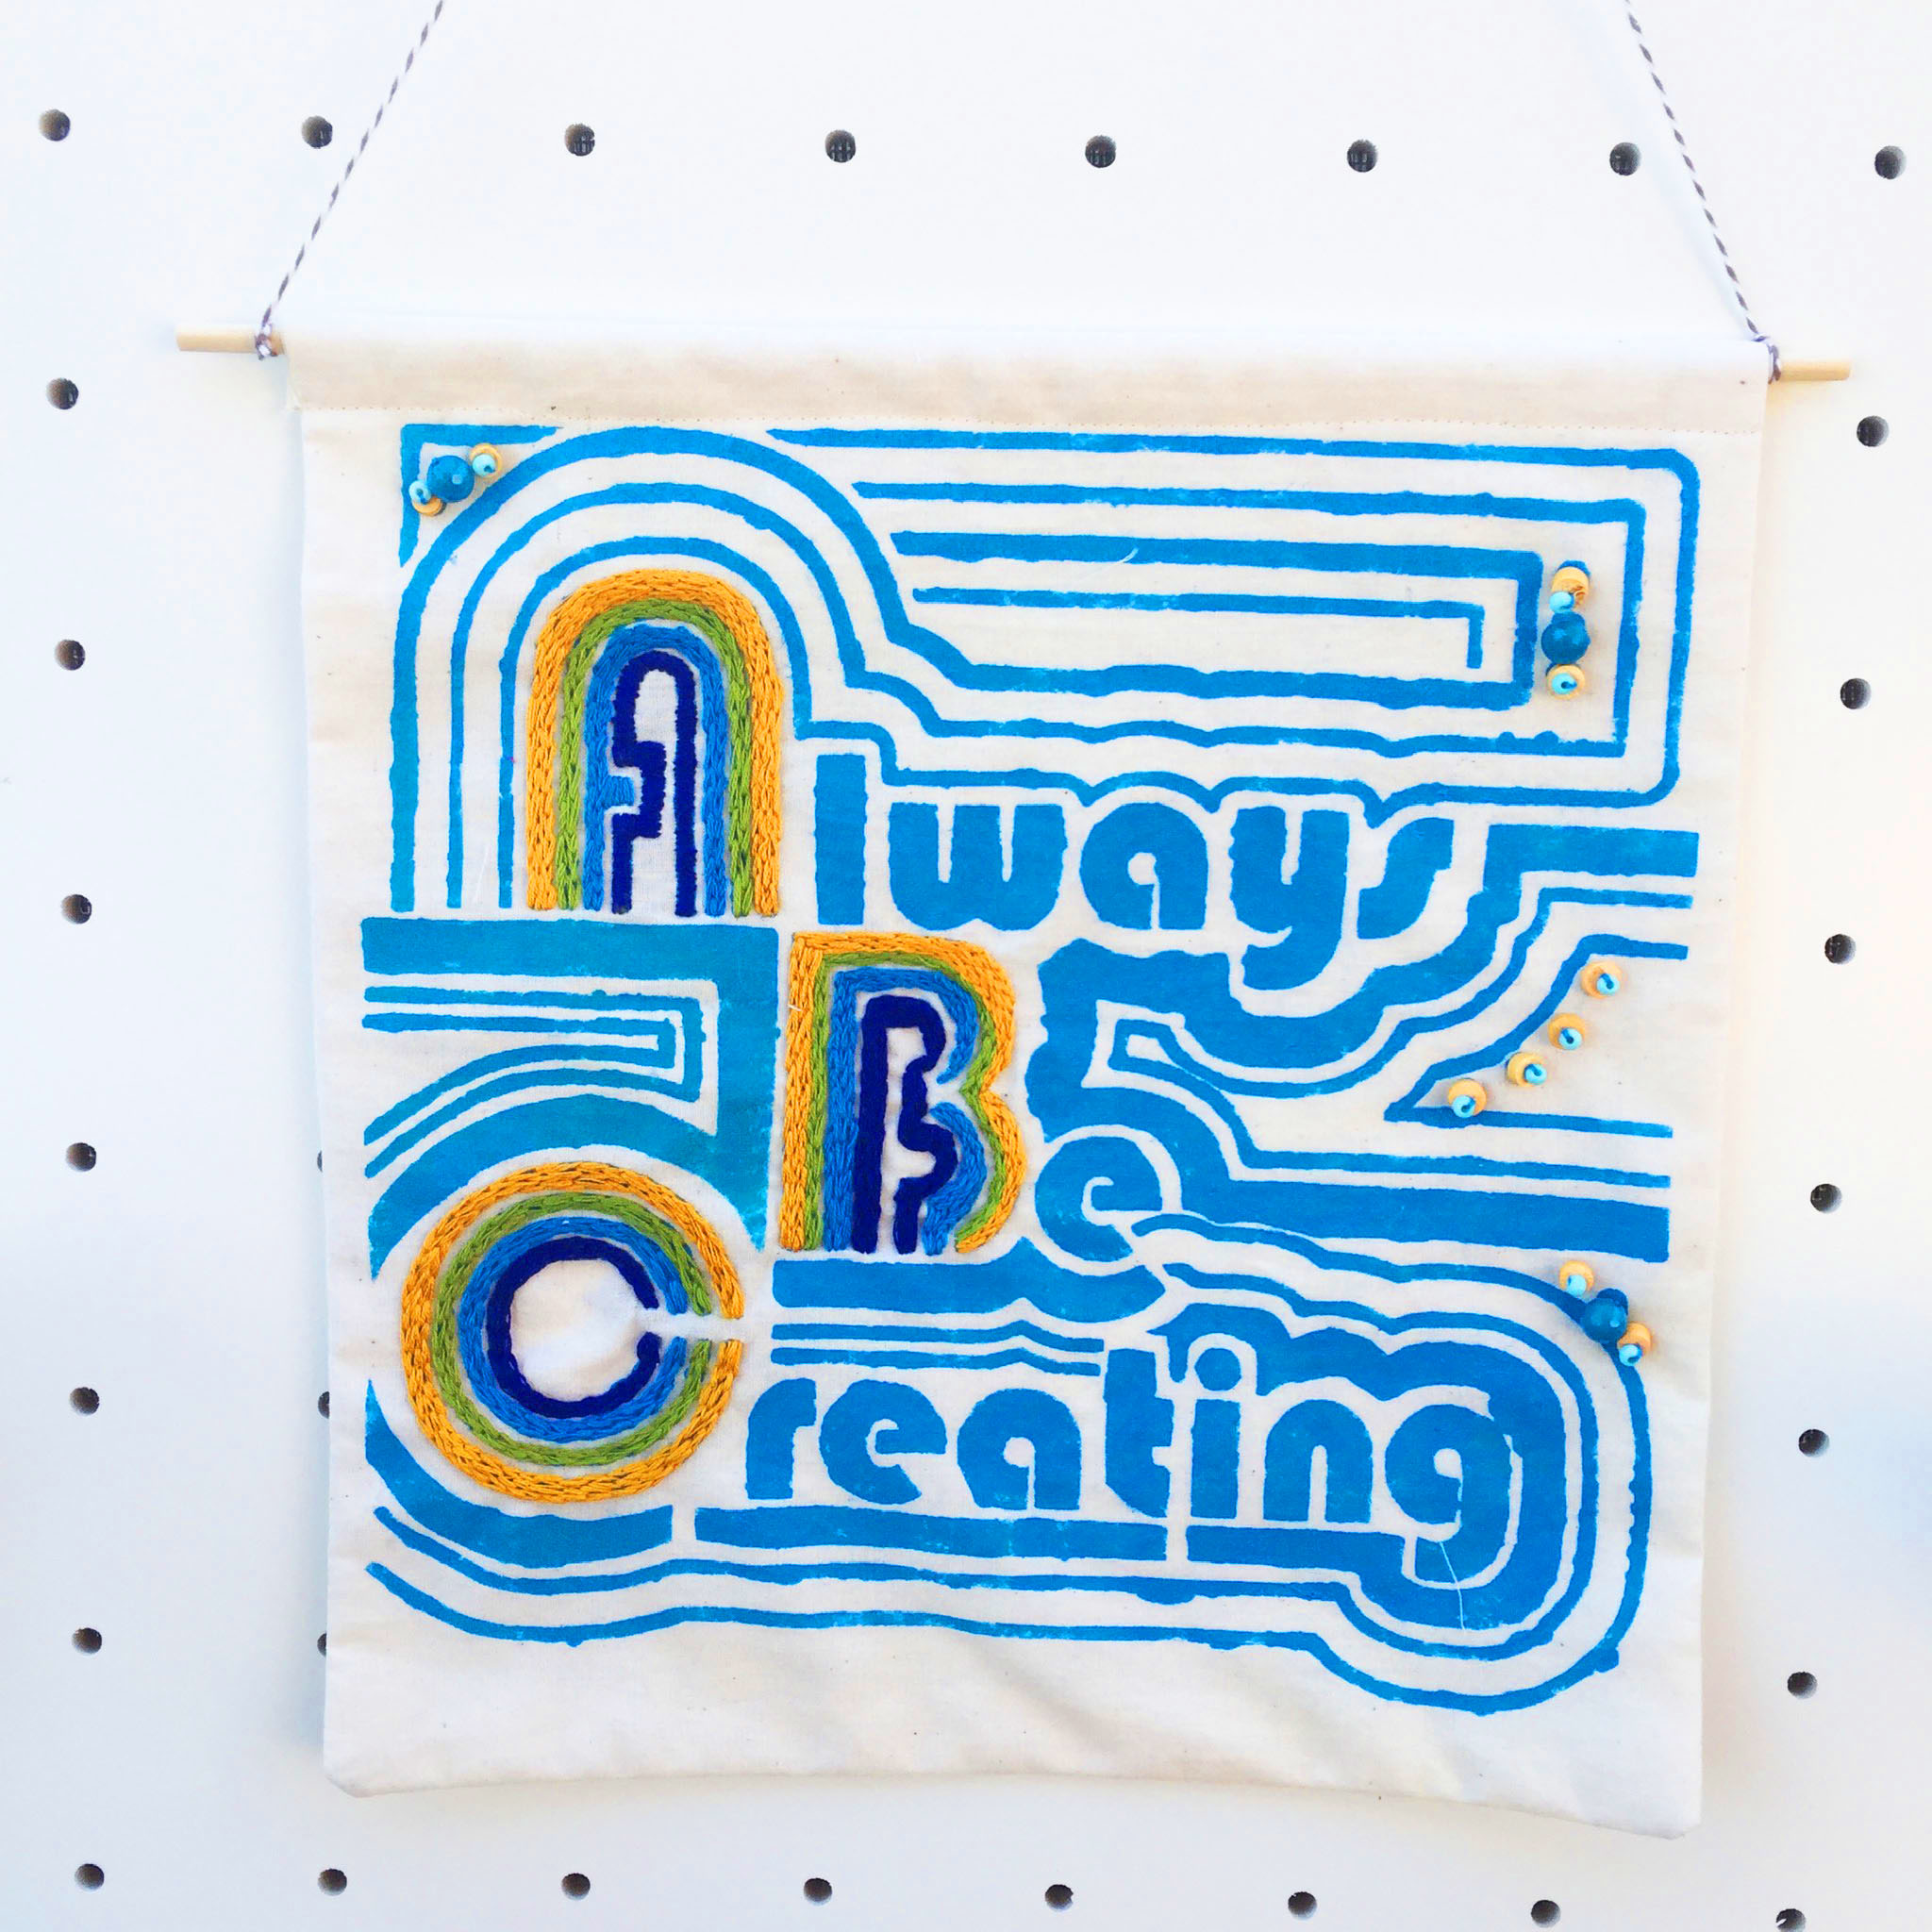 Always-Be-Creating-Wall-Hanging-inspiration-textile-art.jpg